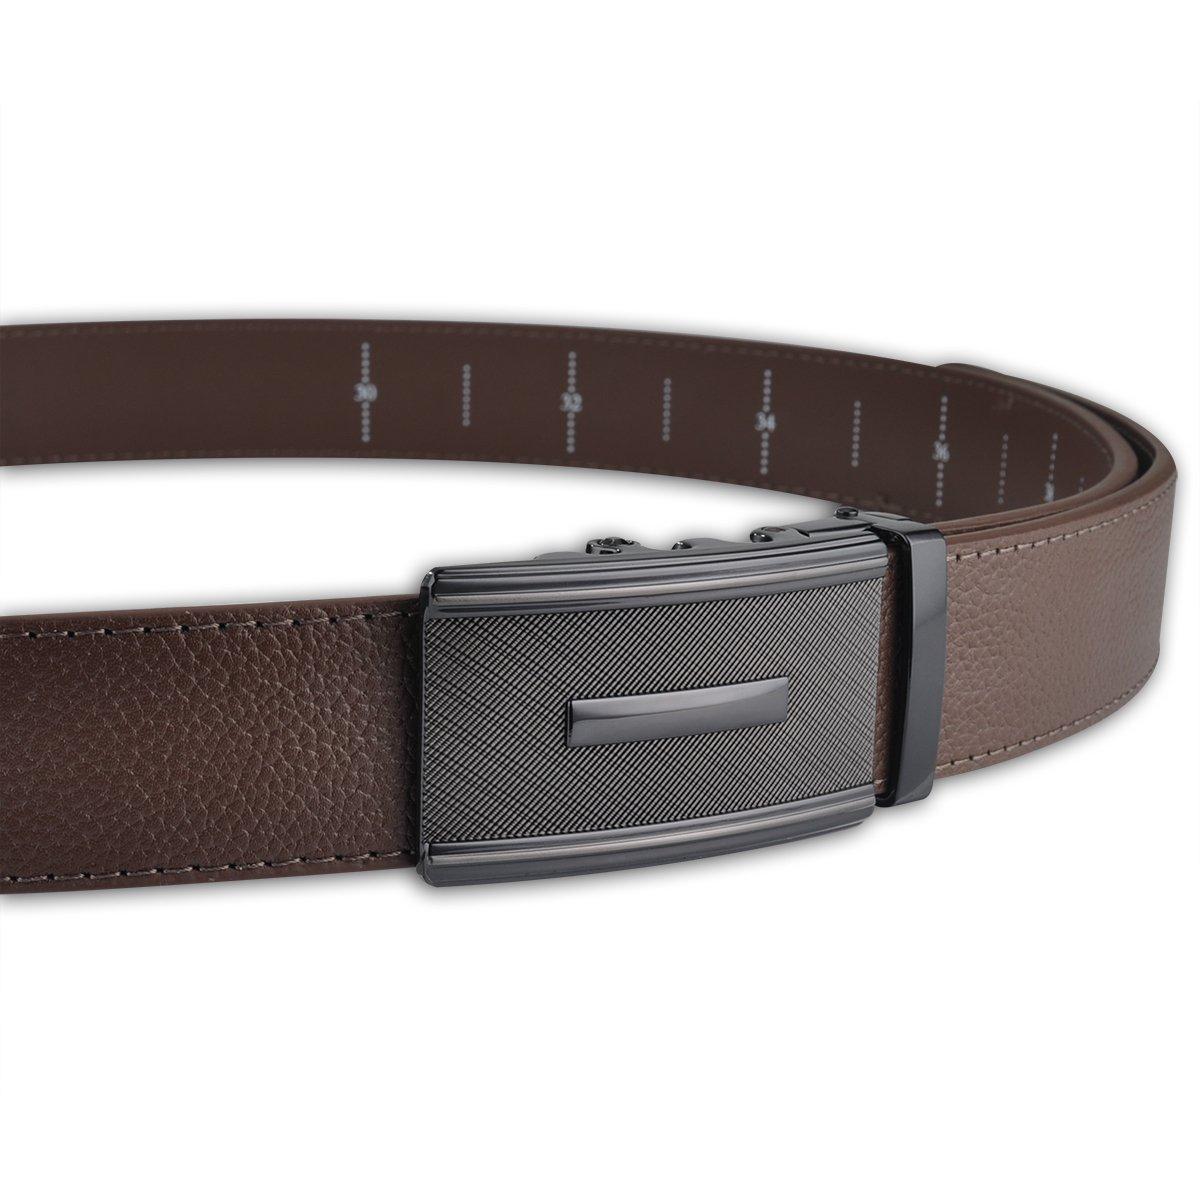 Men Designer Belt Sliding Buckle Ratchet Belt 35mm Wide 1 3/8'' Great Gift Idea by Jun Xiang (Image #6)